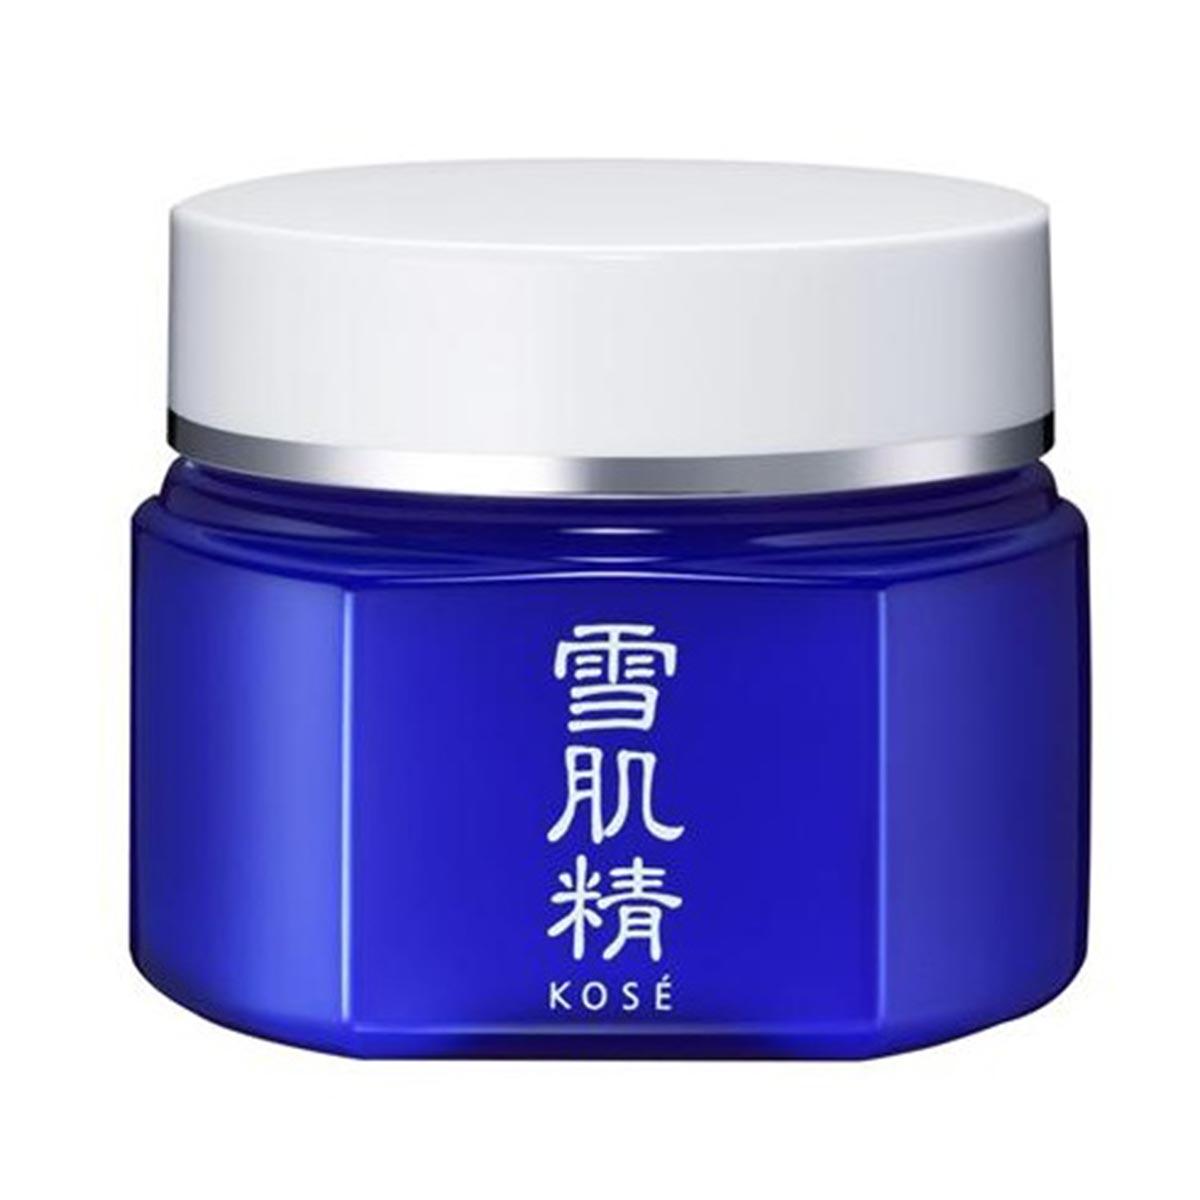 Sekkisei cleansing cream 140ml